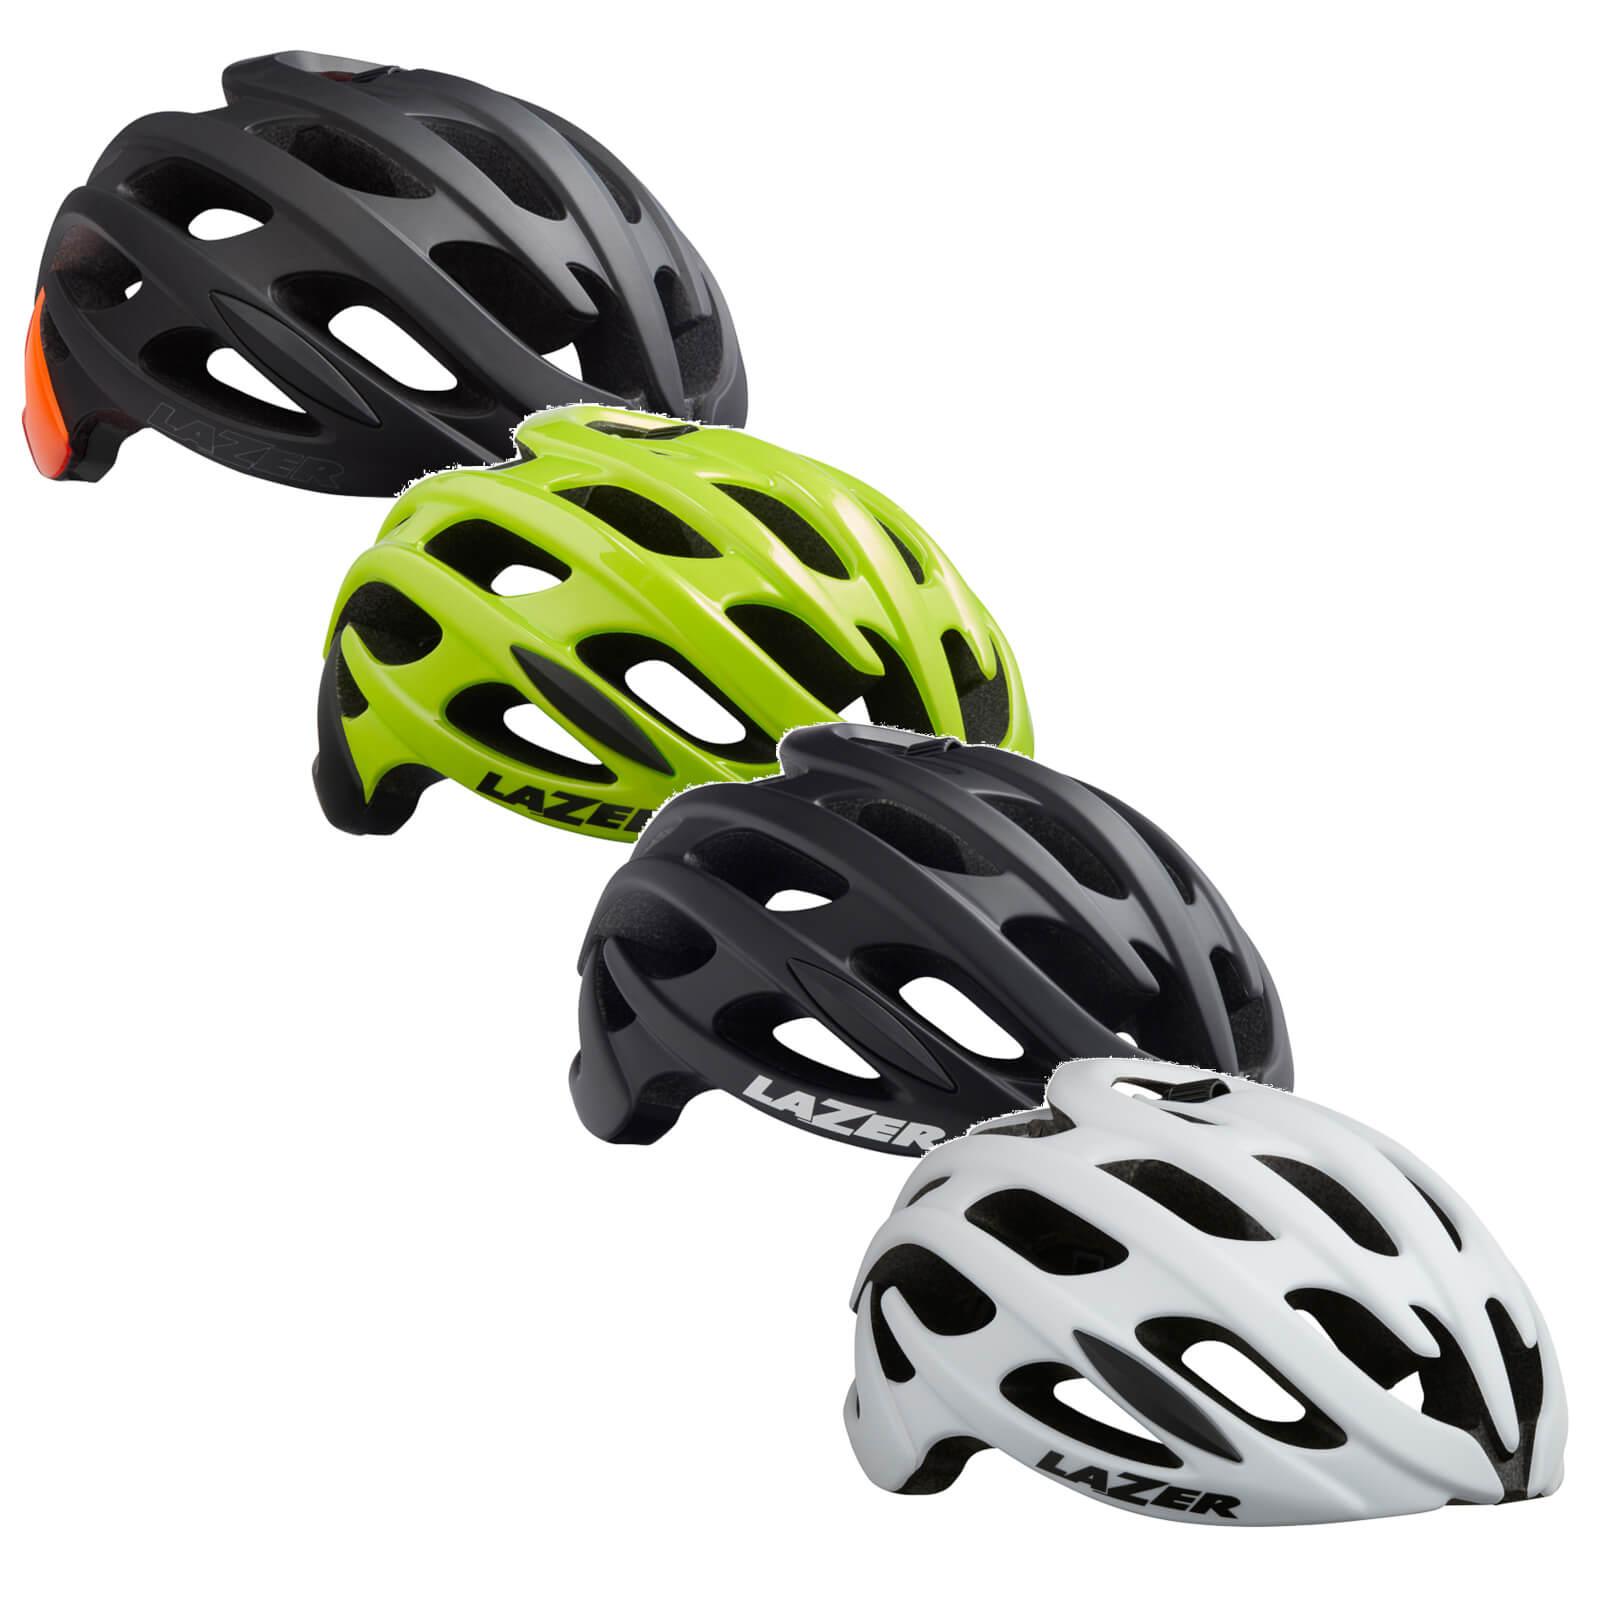 Lazer Blade MIPS Road Helmet - S - Flash Yellow